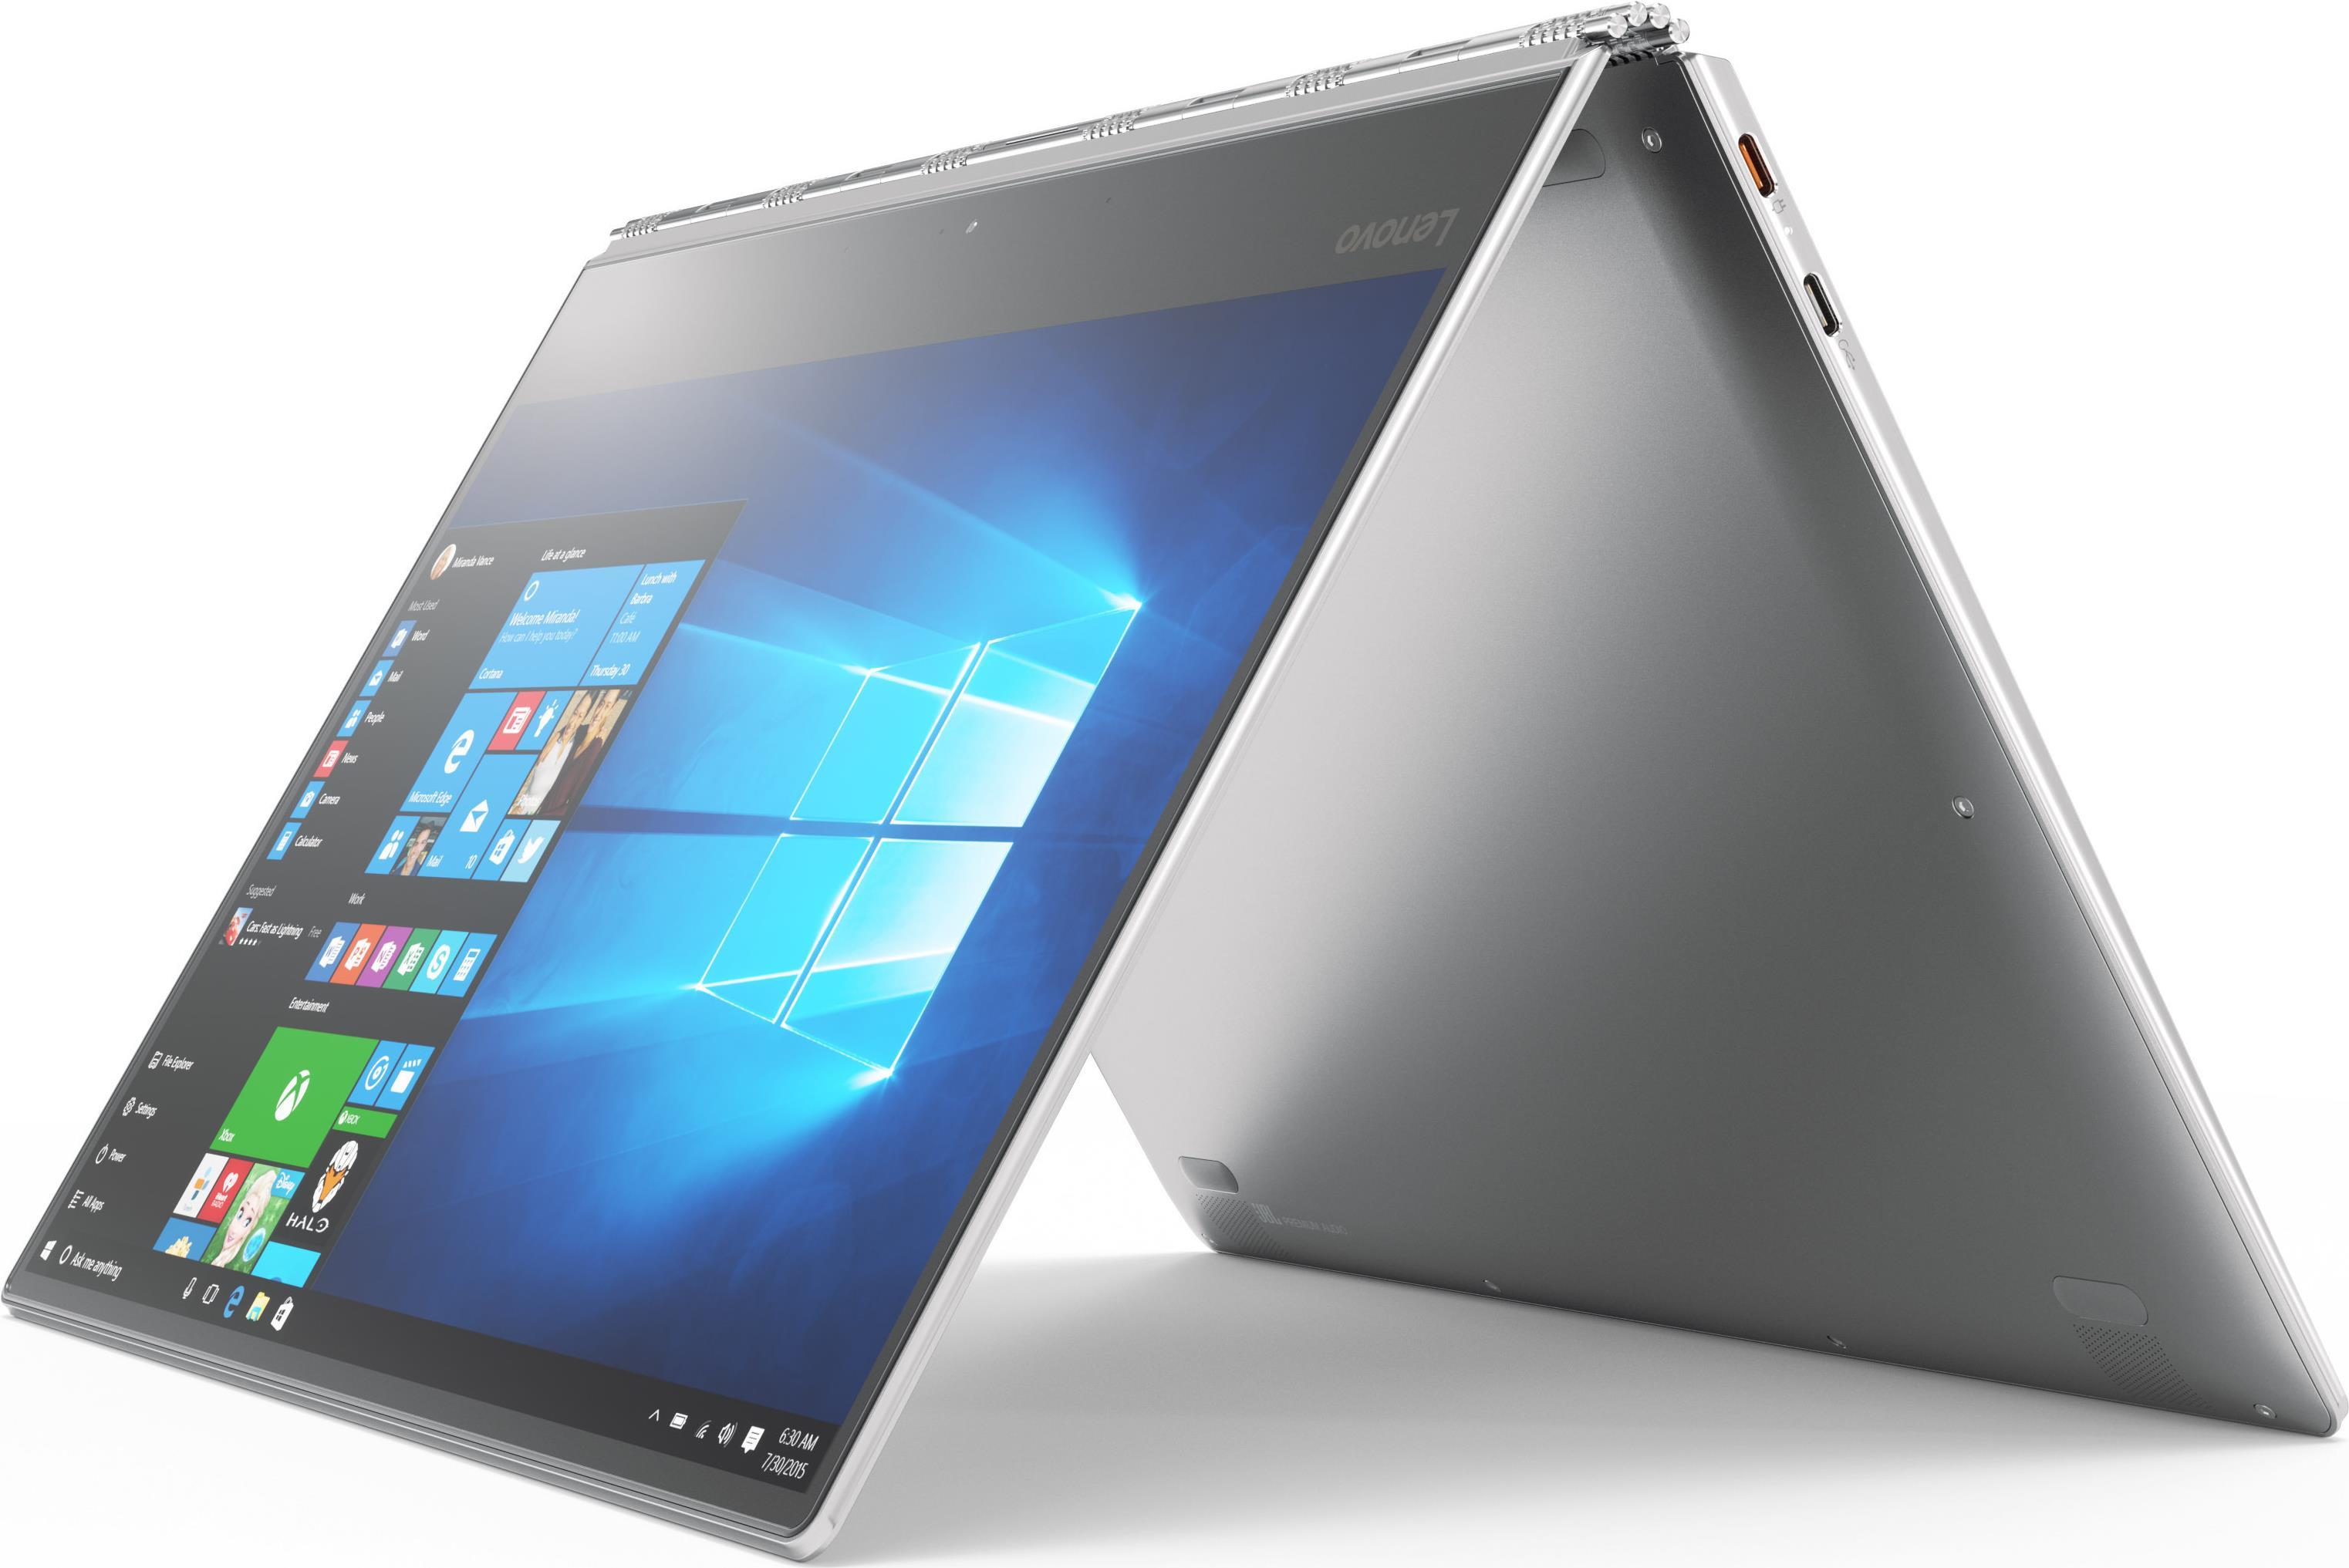 Lenovo Yoga 920 13IKB 80Y7 Flip Design Core i7 8550U 1 8 GHz 80Y GE